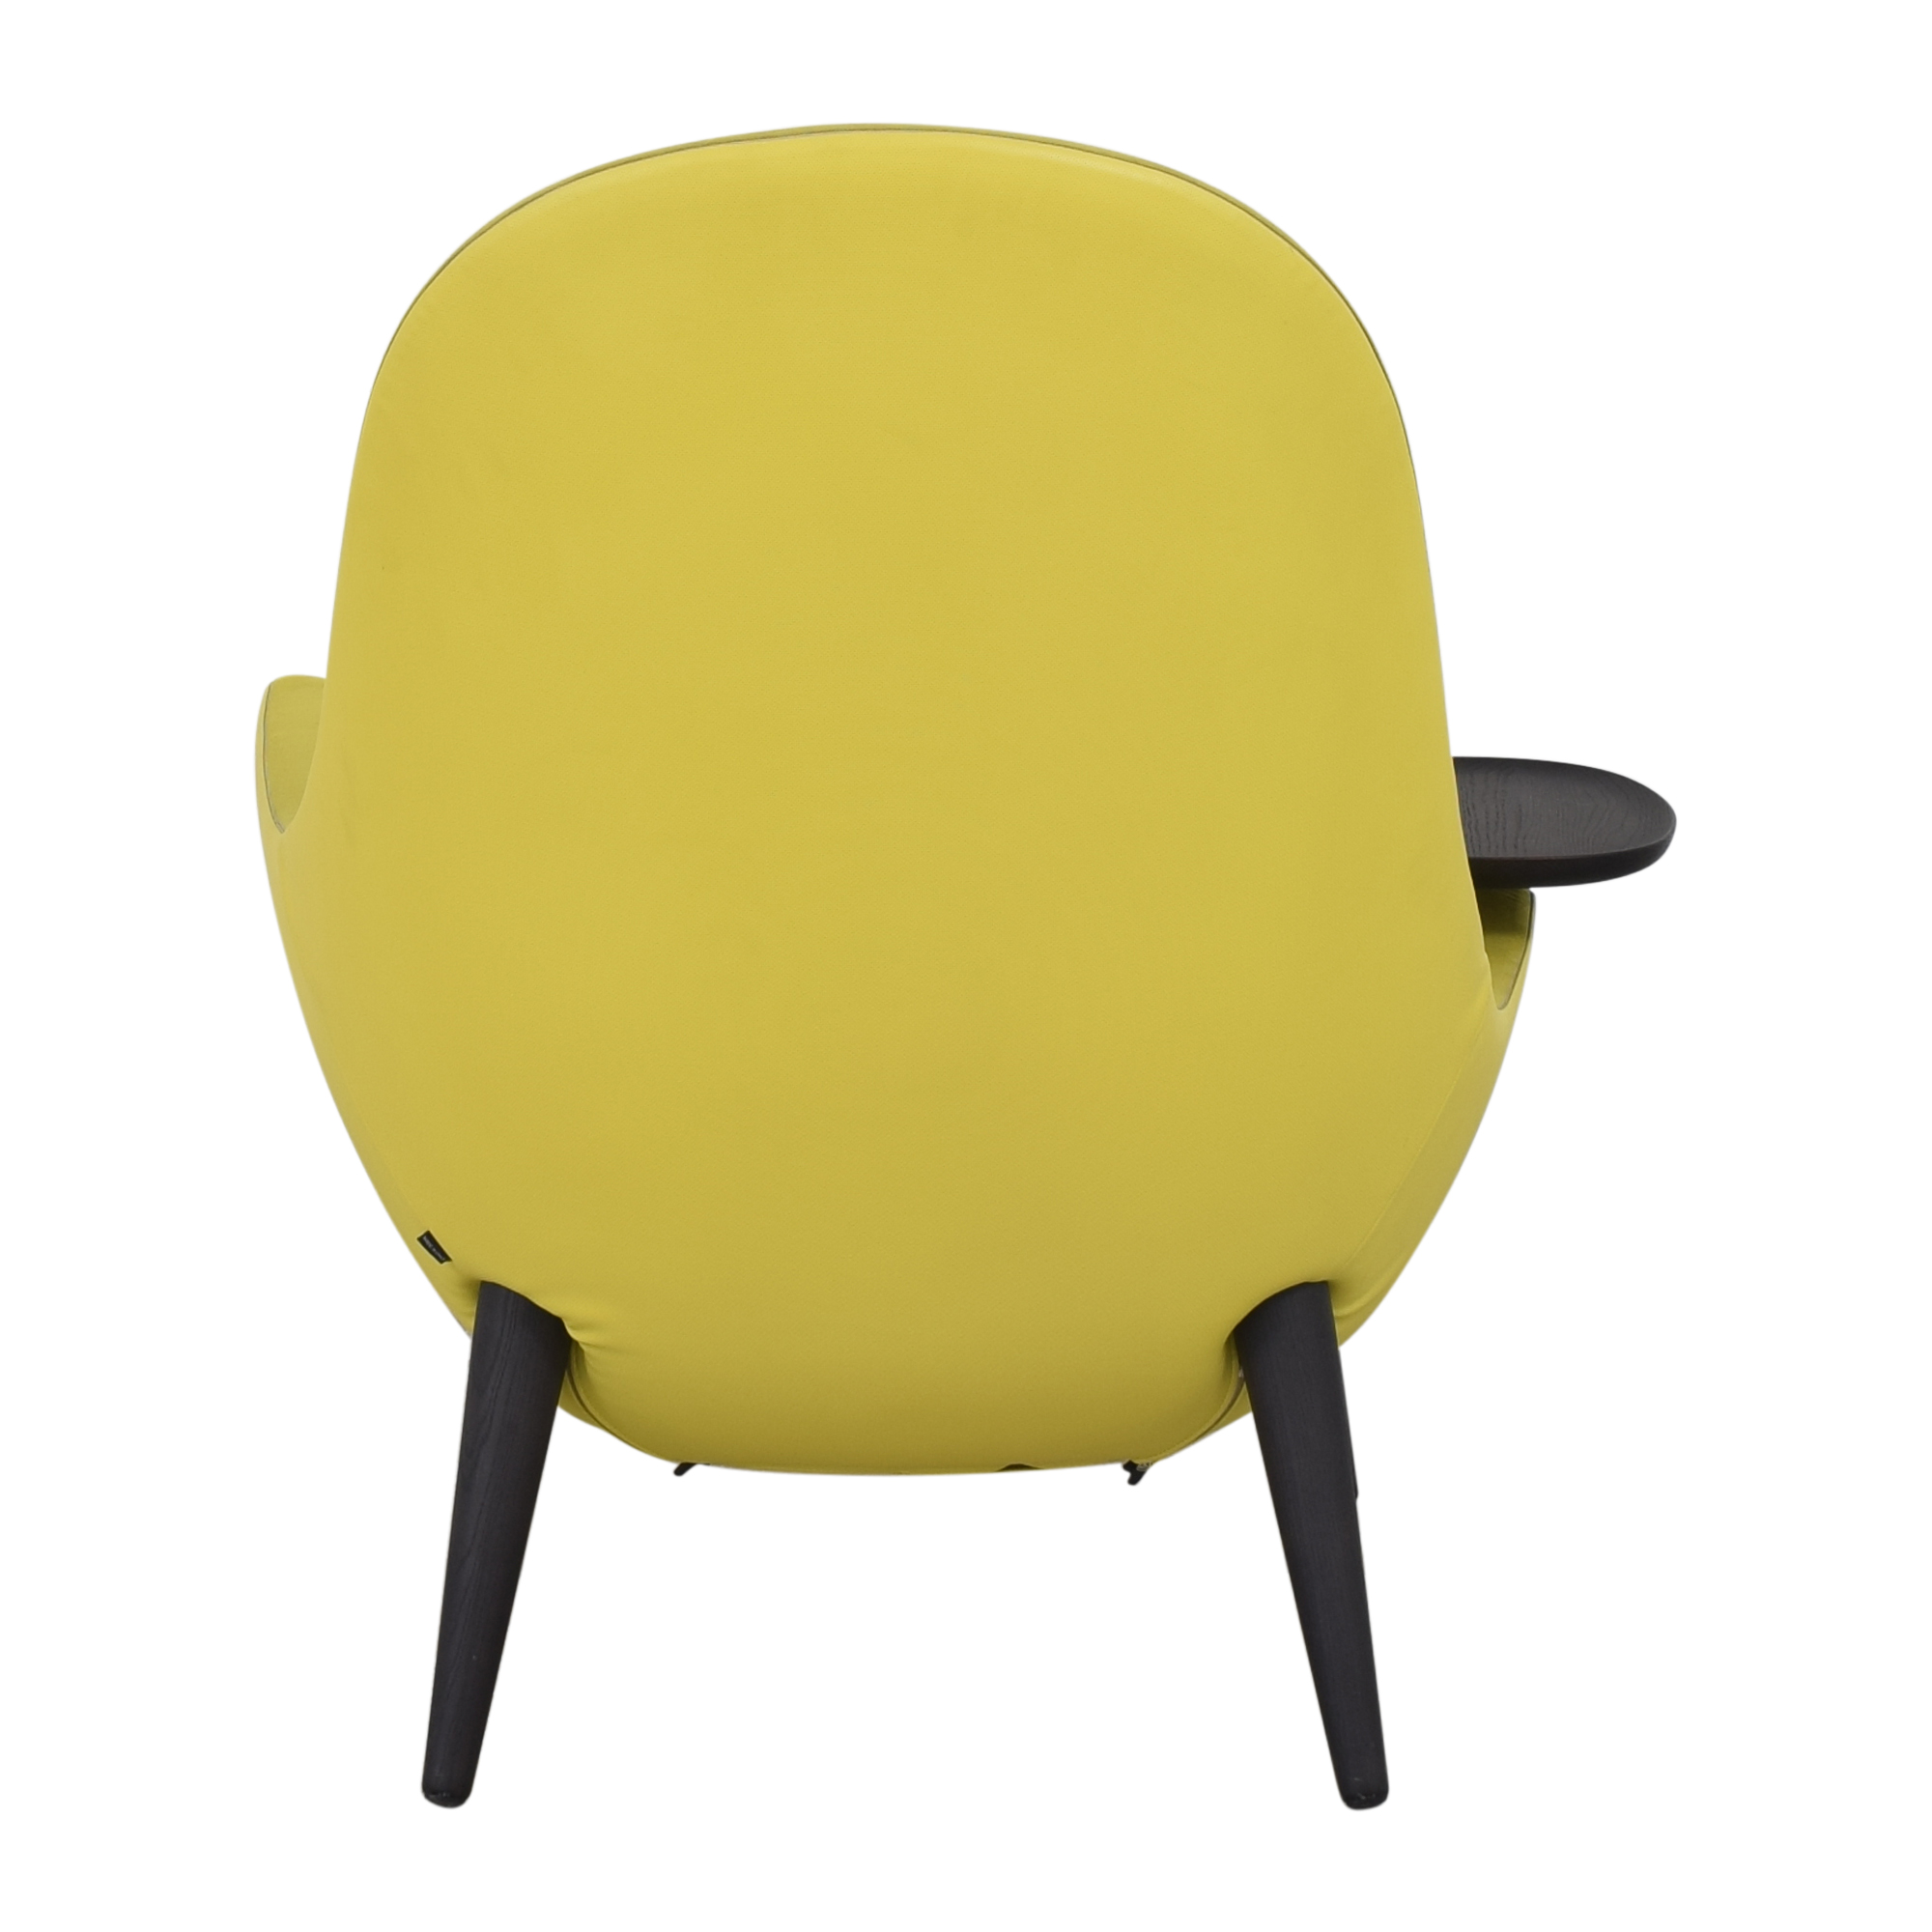 Poliform Mad King Chair Poliform